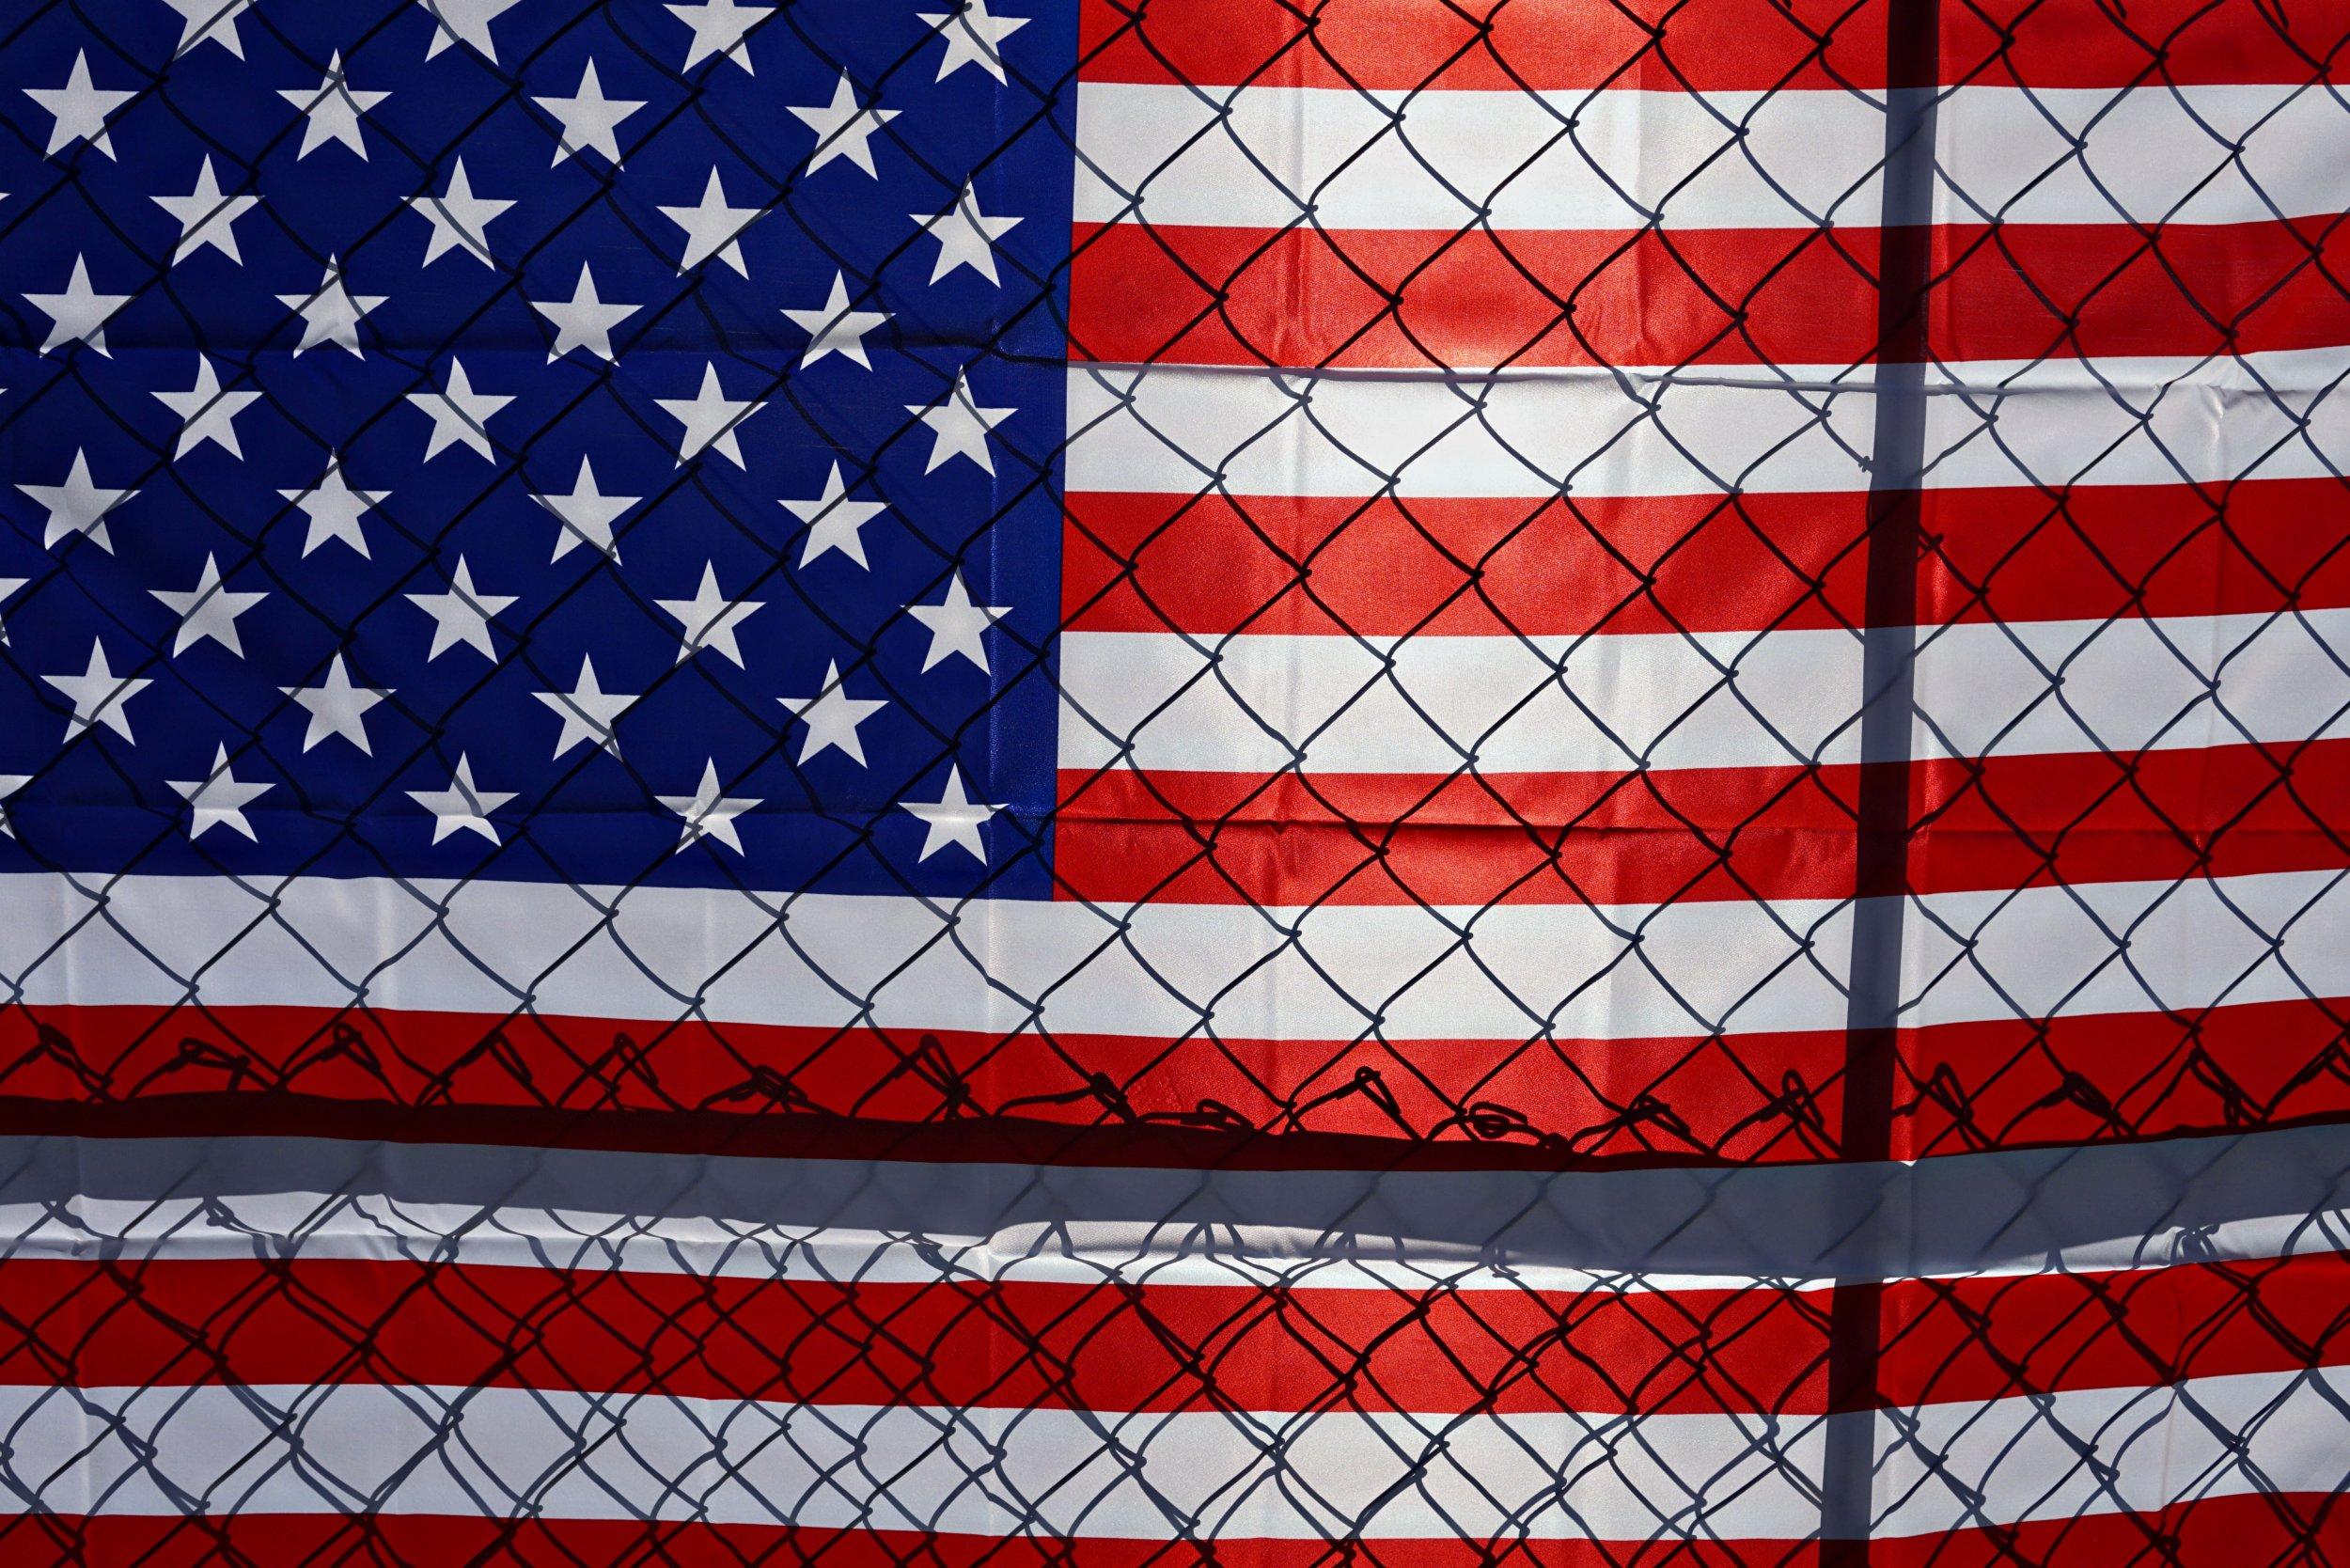 Mexico-Wall-Trump-Tijuana-Ysidro-Asylum-Seekers-1073979130